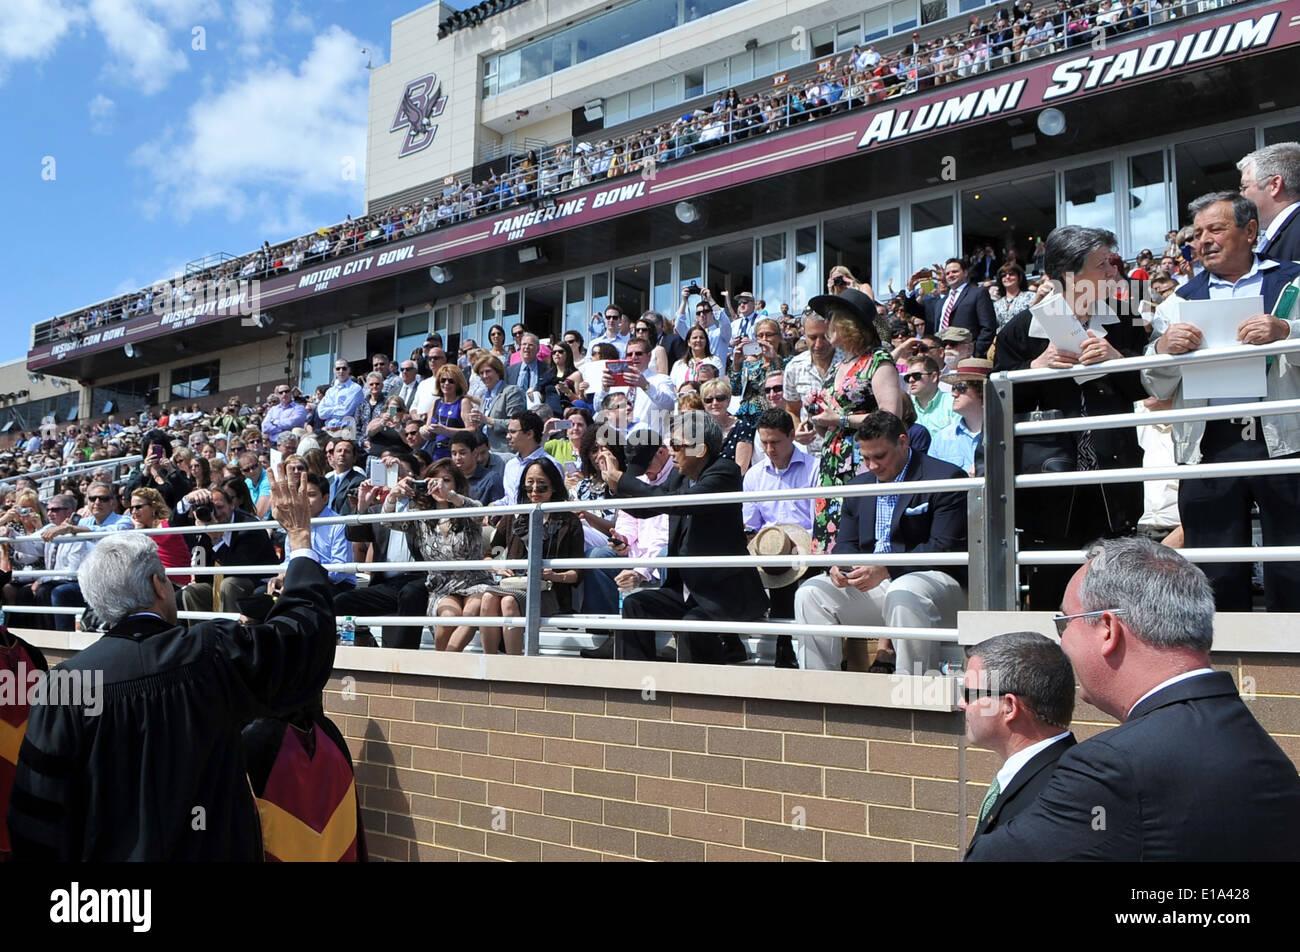 Secretary Kerry Waves to Families, Friends of Boston College Graduates - Stock Image